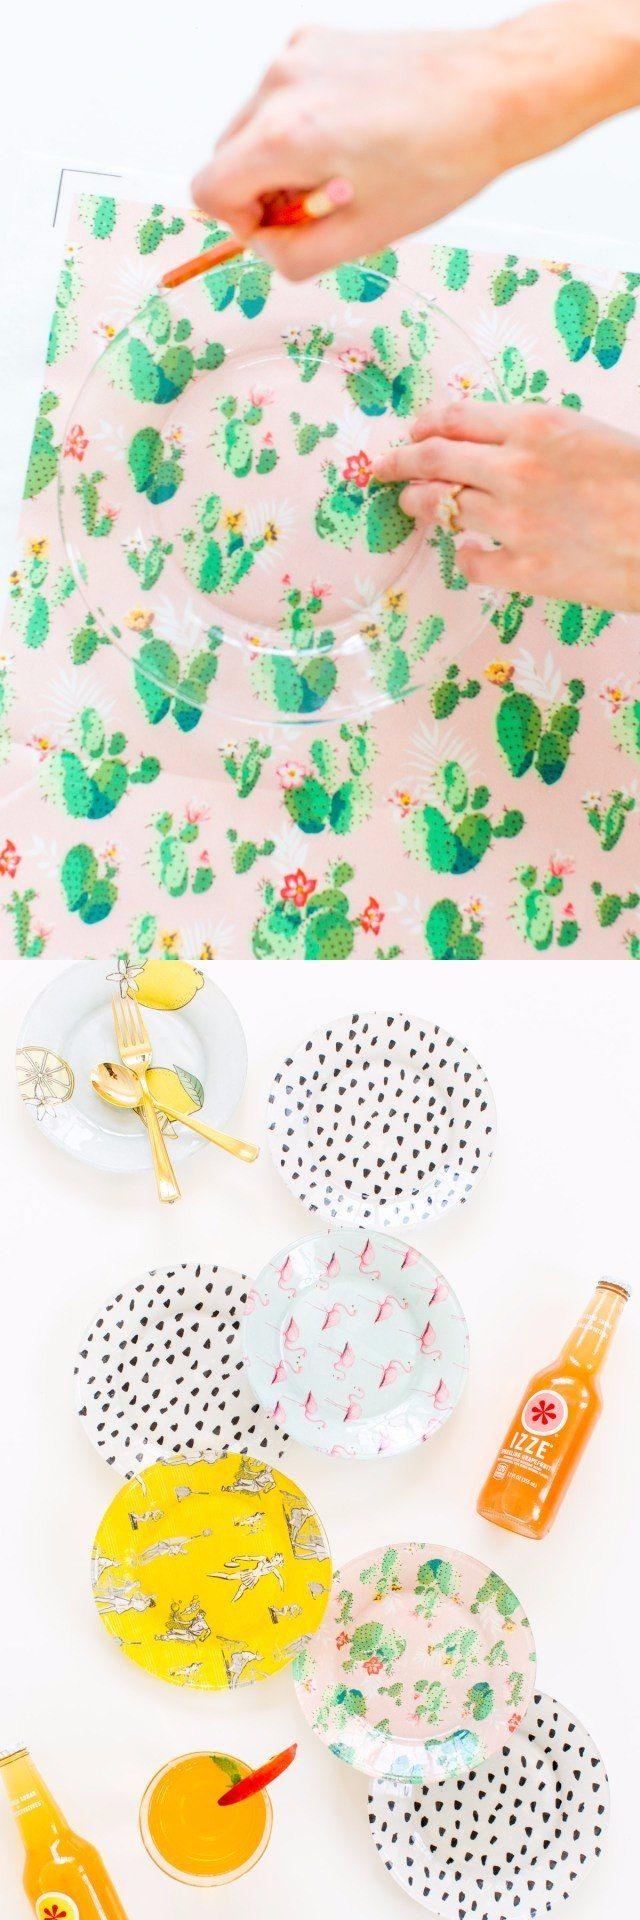 Decoupage para decorar platos - petitecandela.blogspot.es